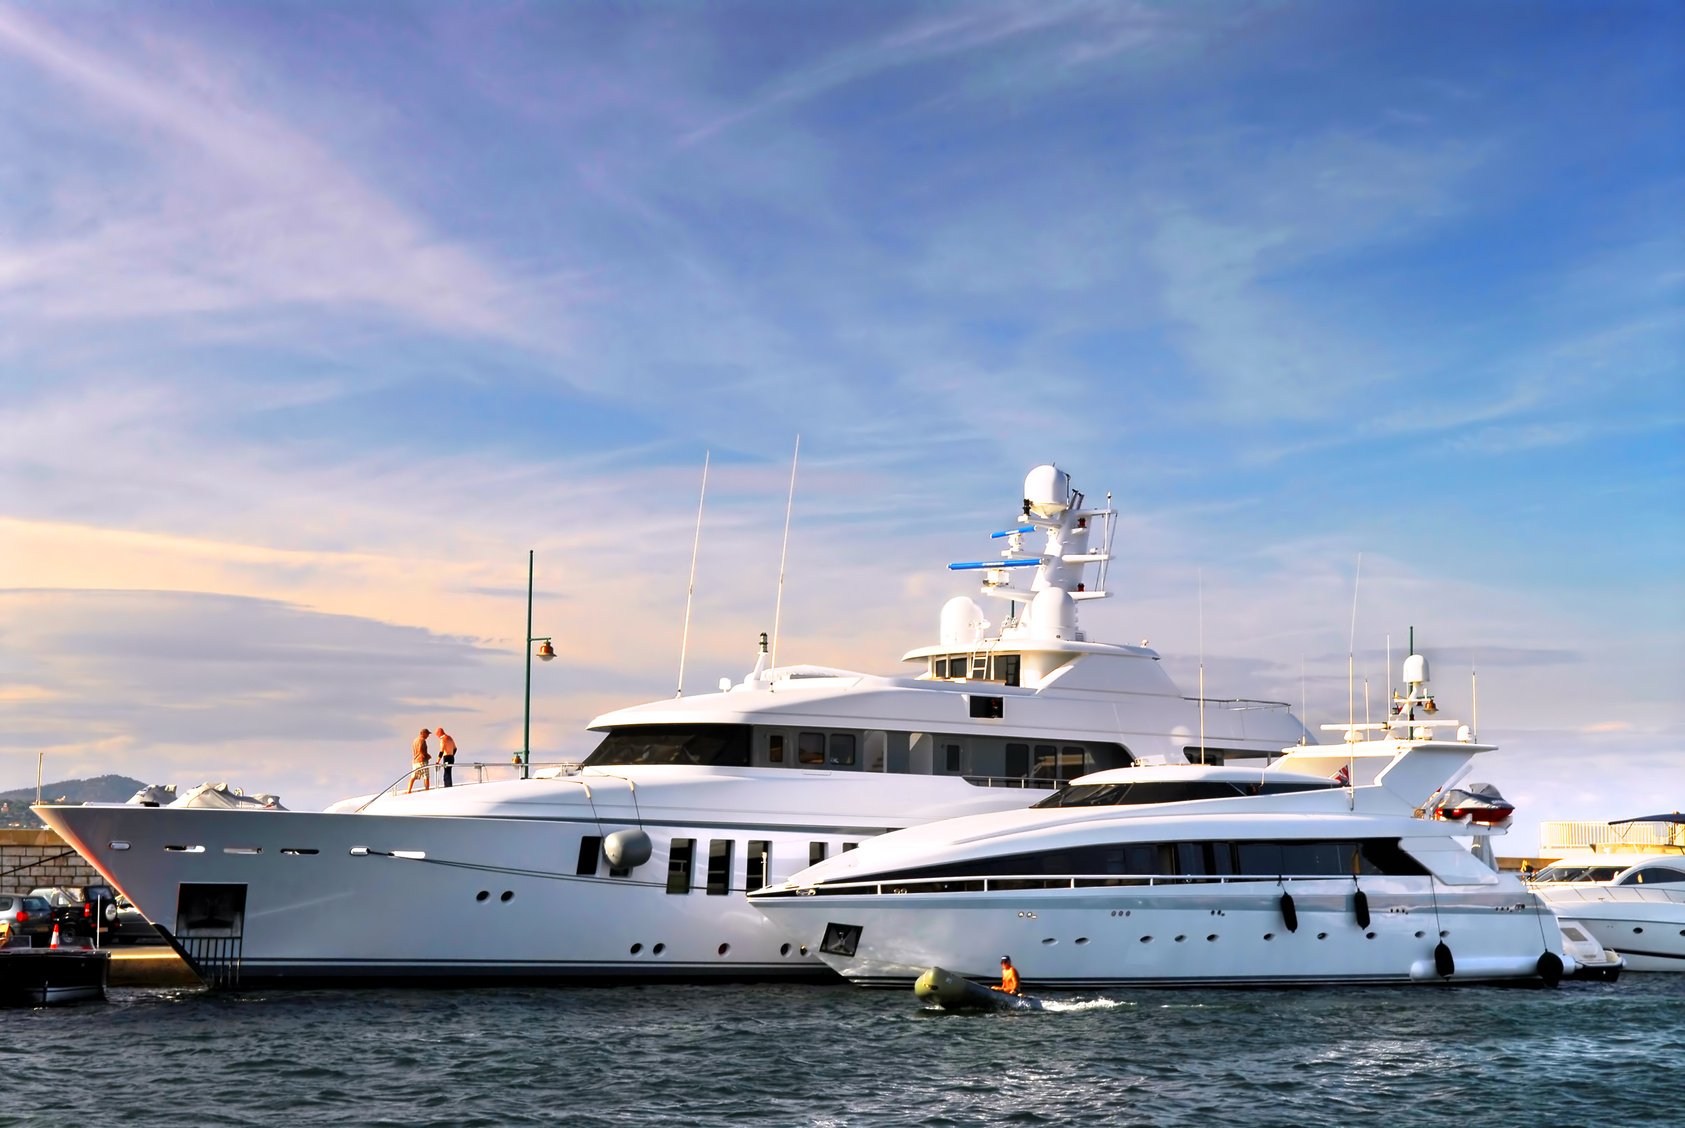 amalfi-yacht-charter-amalfi-yacht-rental-luxury-crewed-yacht-mega-yacht